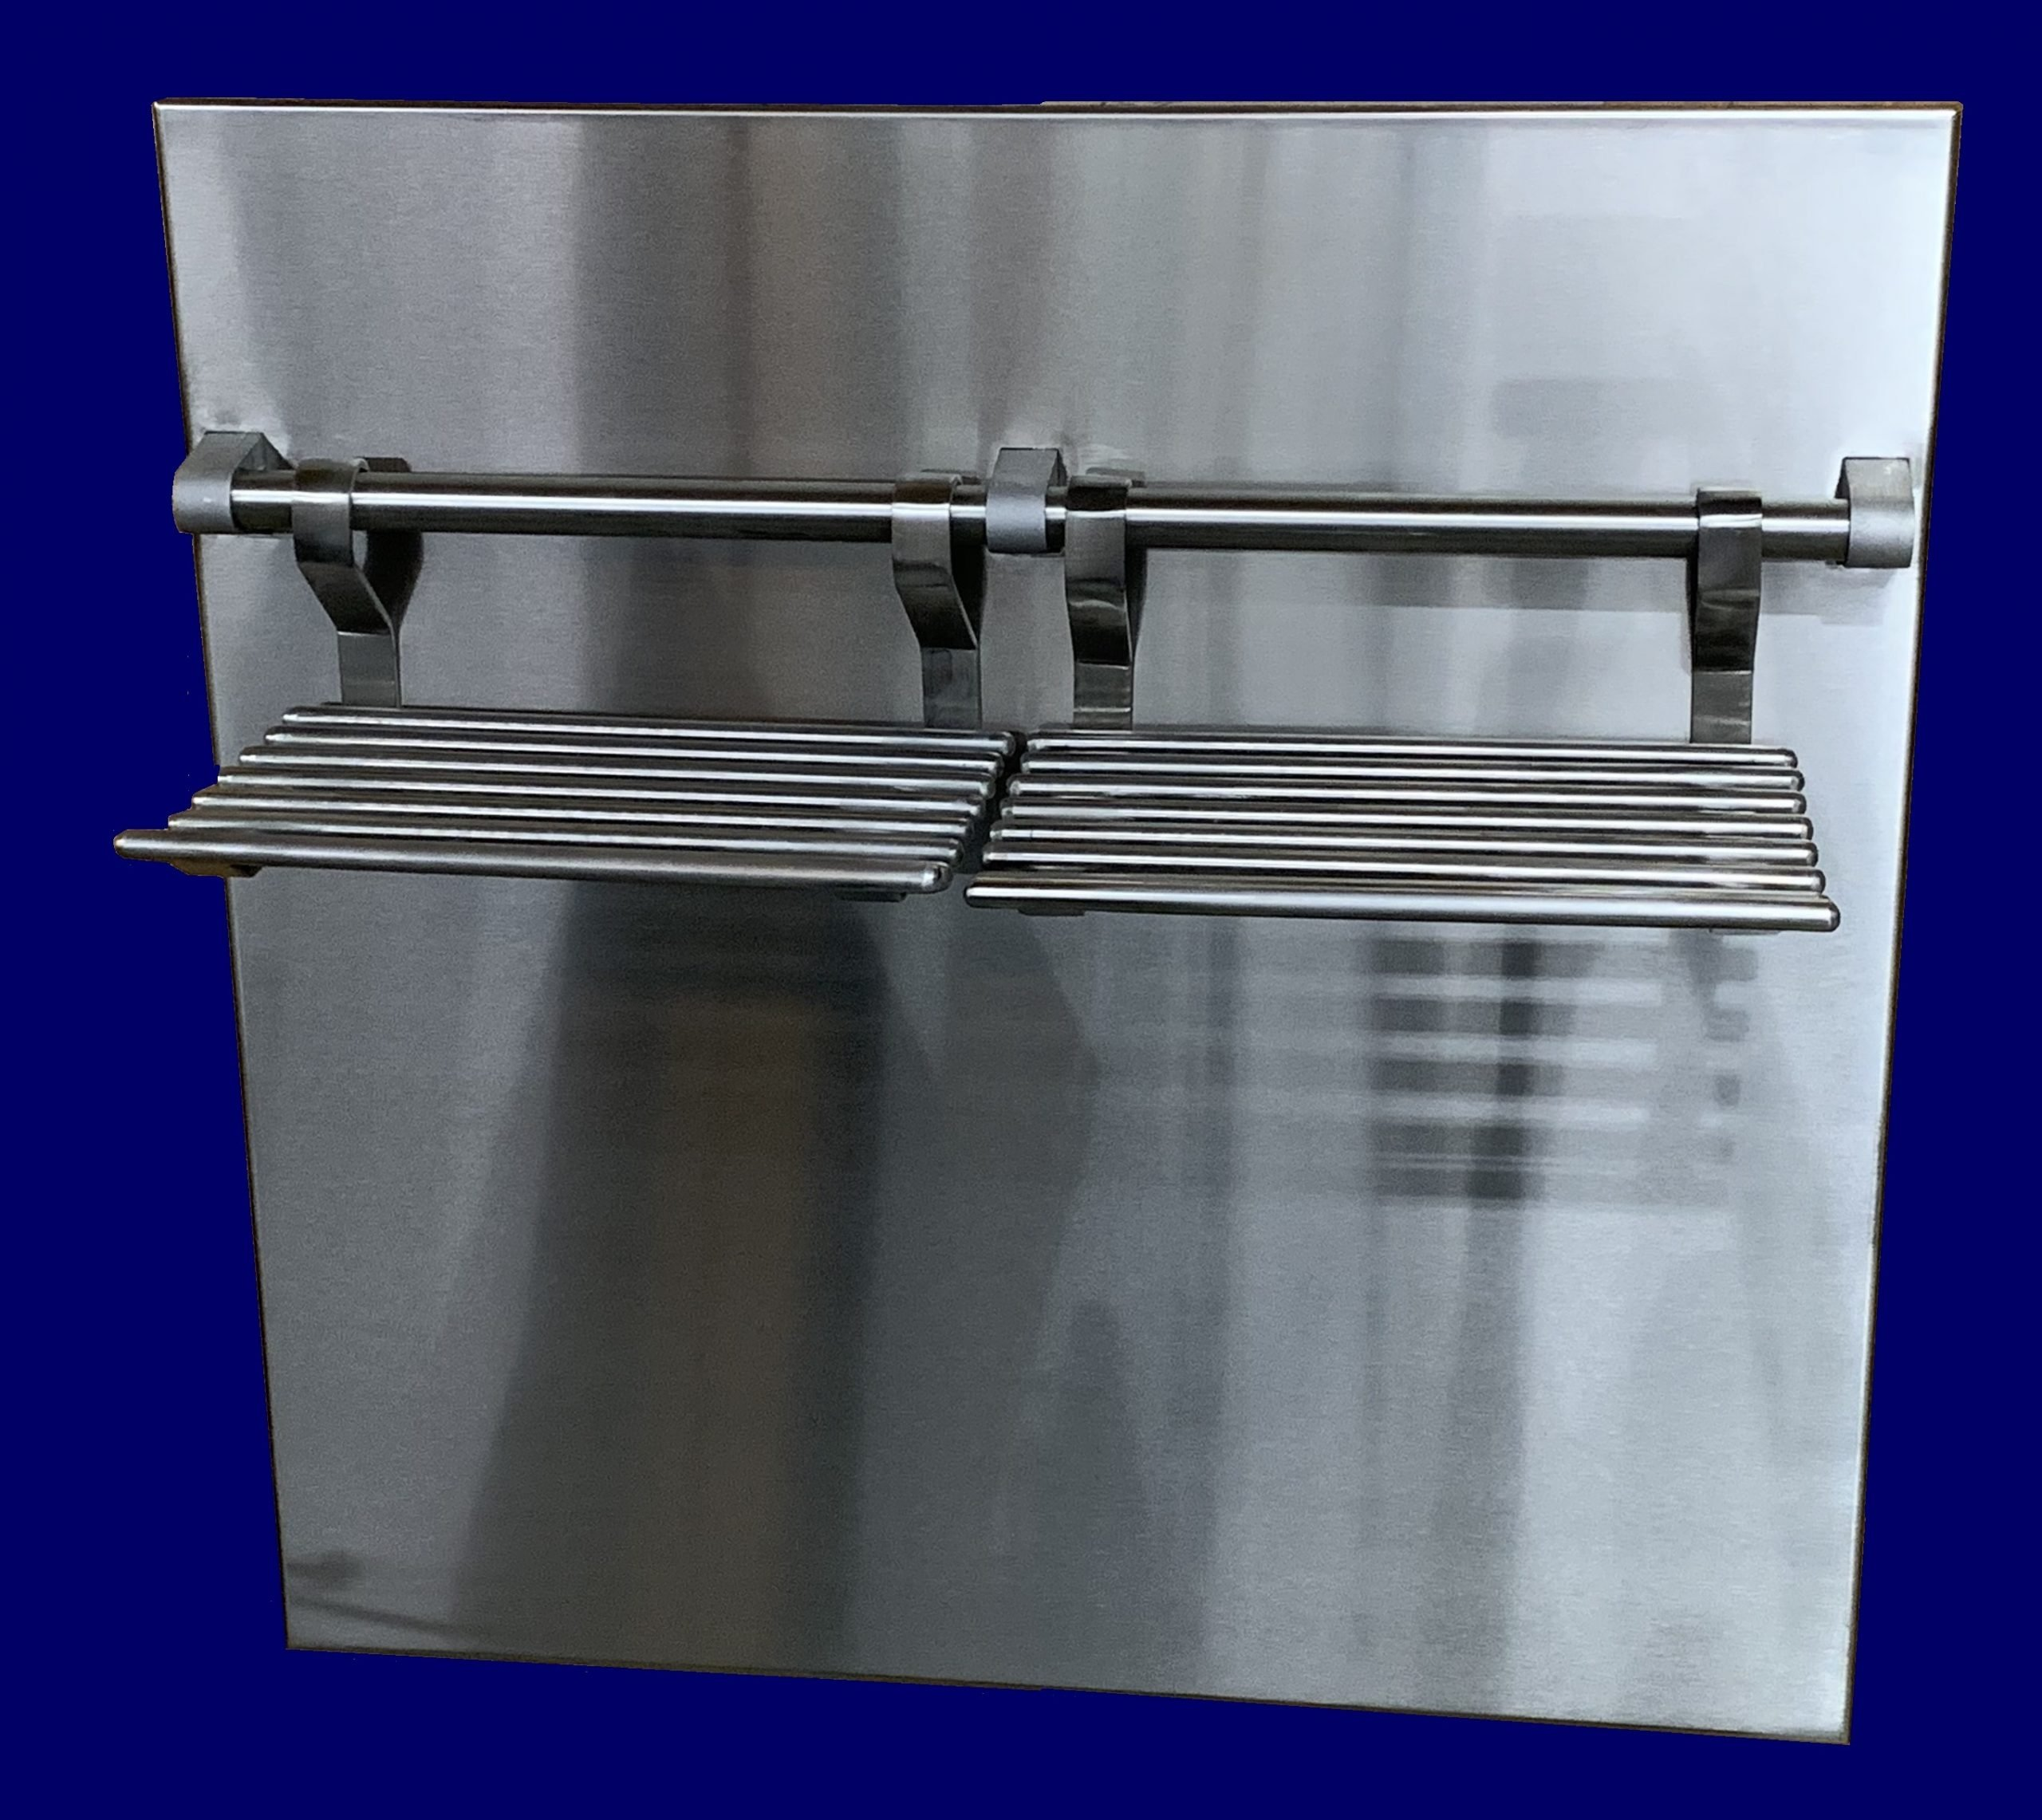 Custom Stainless Steel Residential Backsplash with Cooling Racks